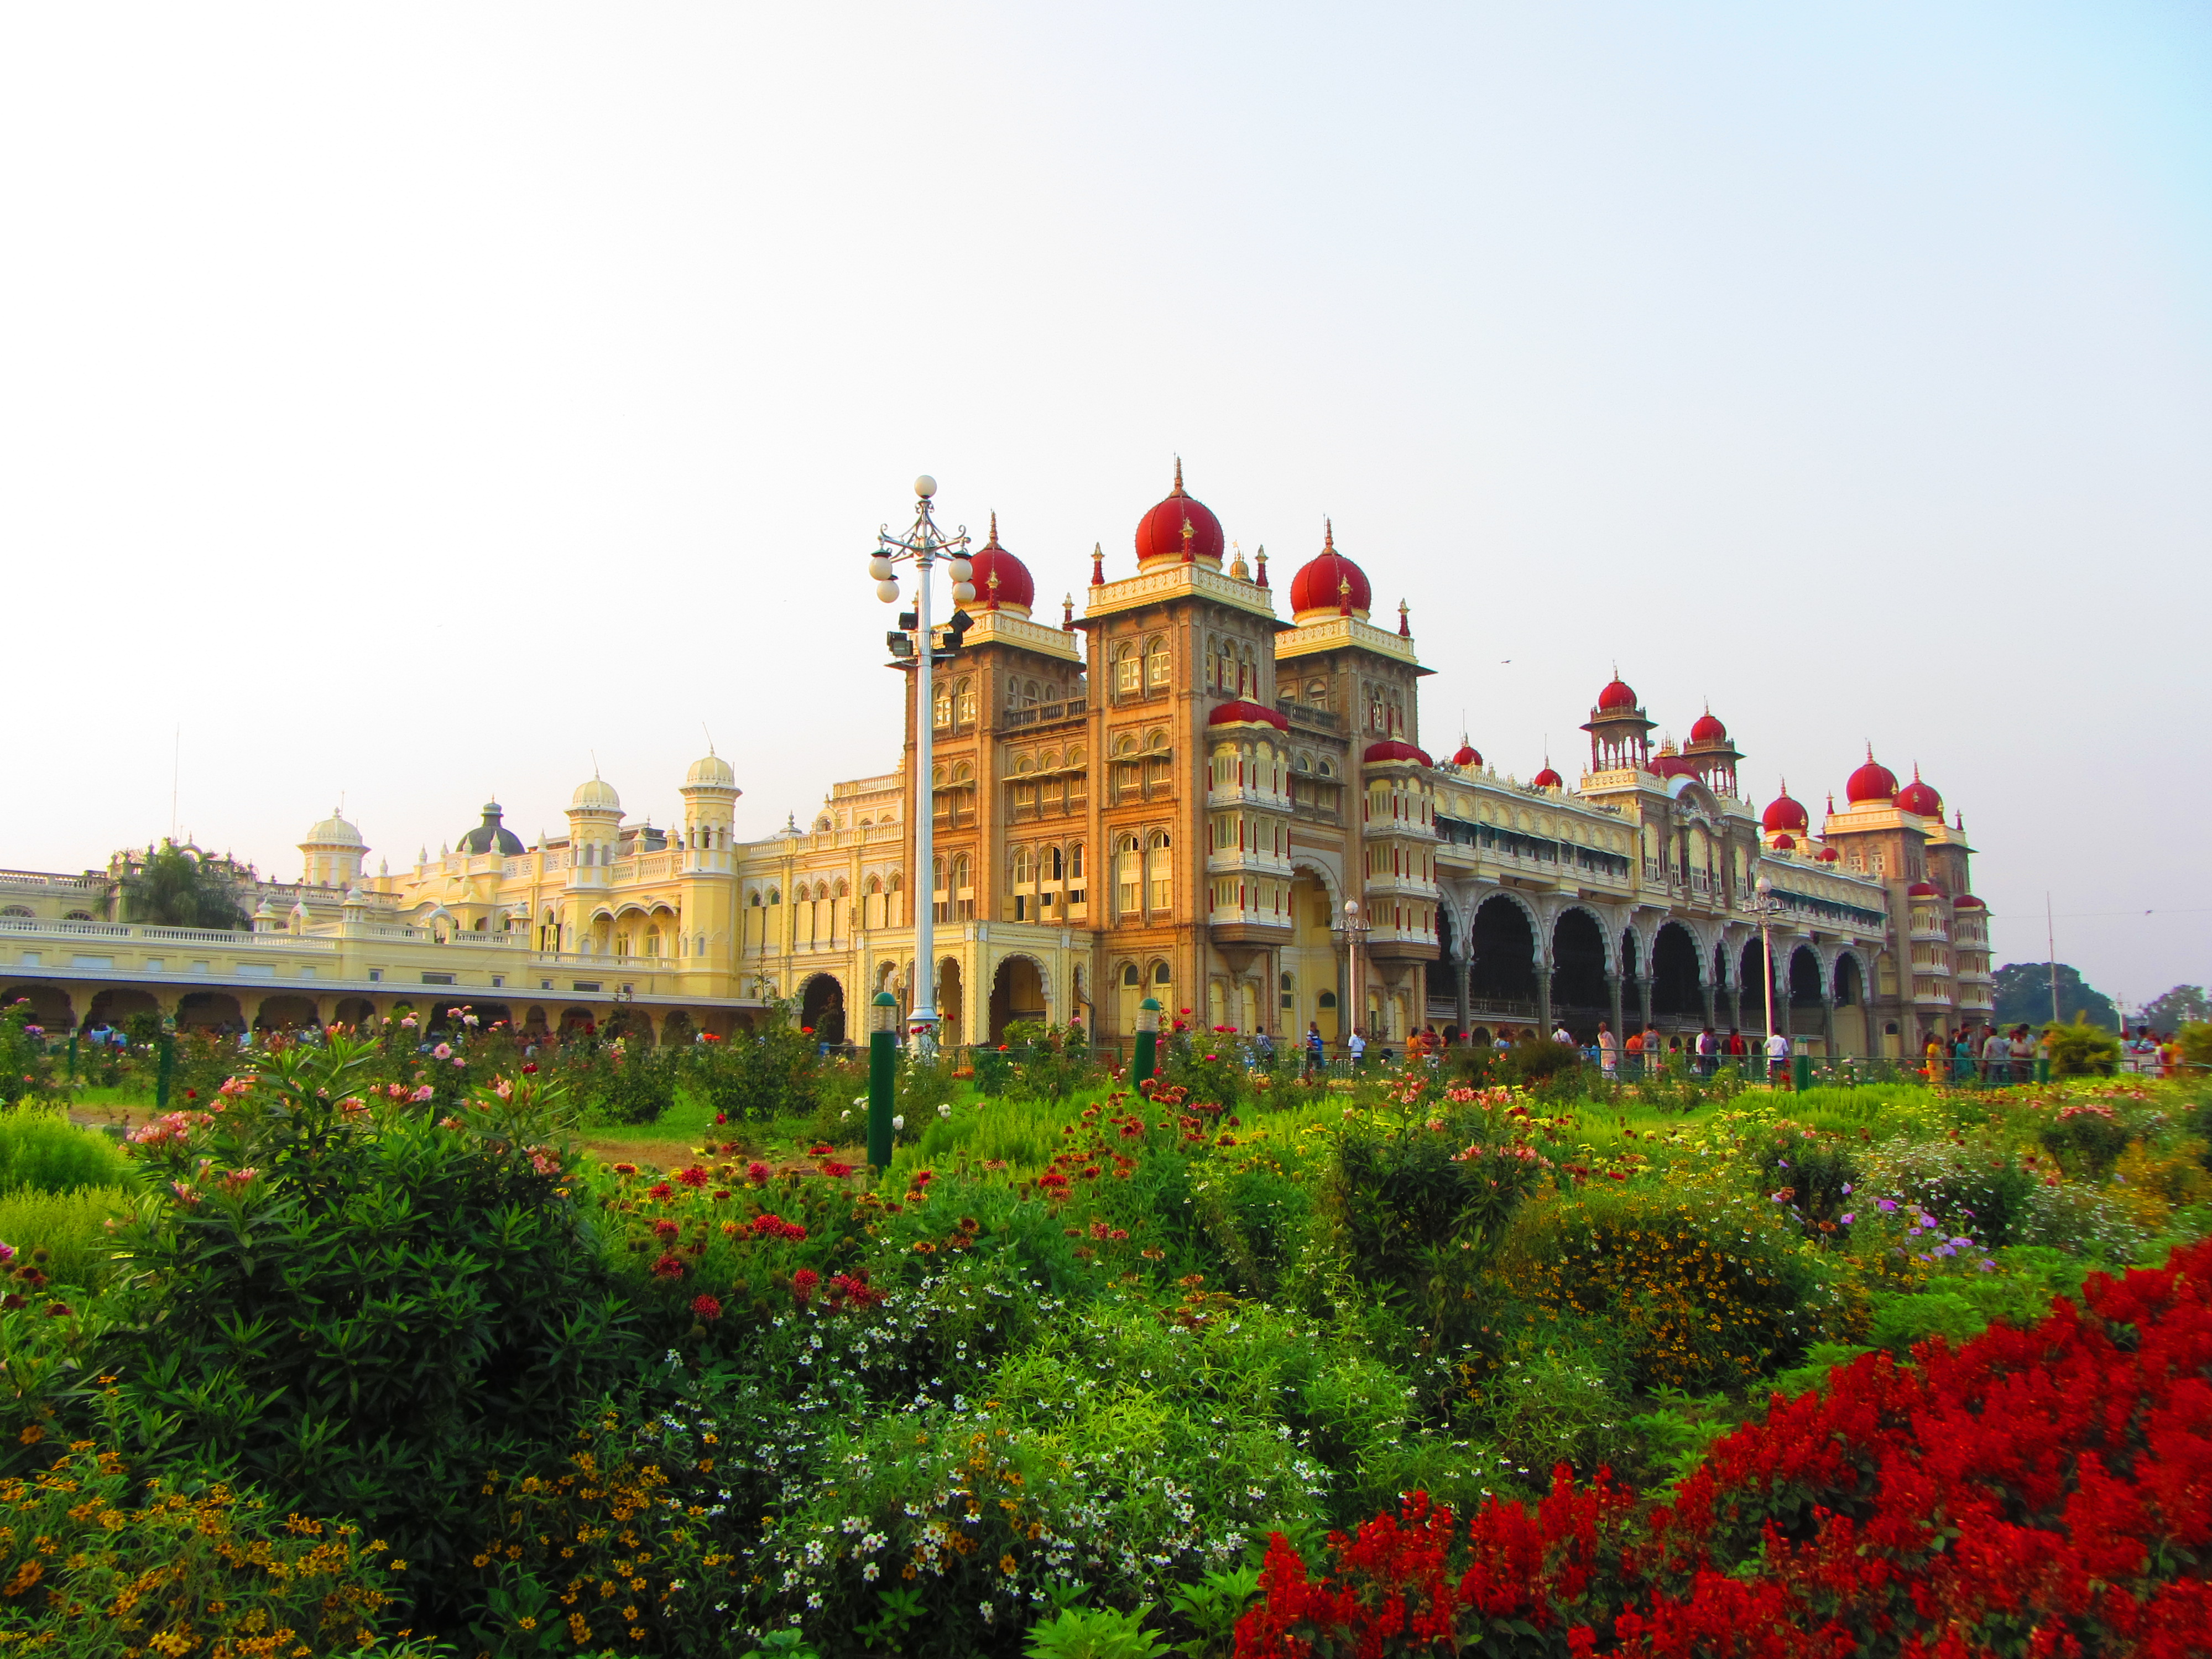 Loveawake darmowe randki online Indie Karnataka miasto Bangalore